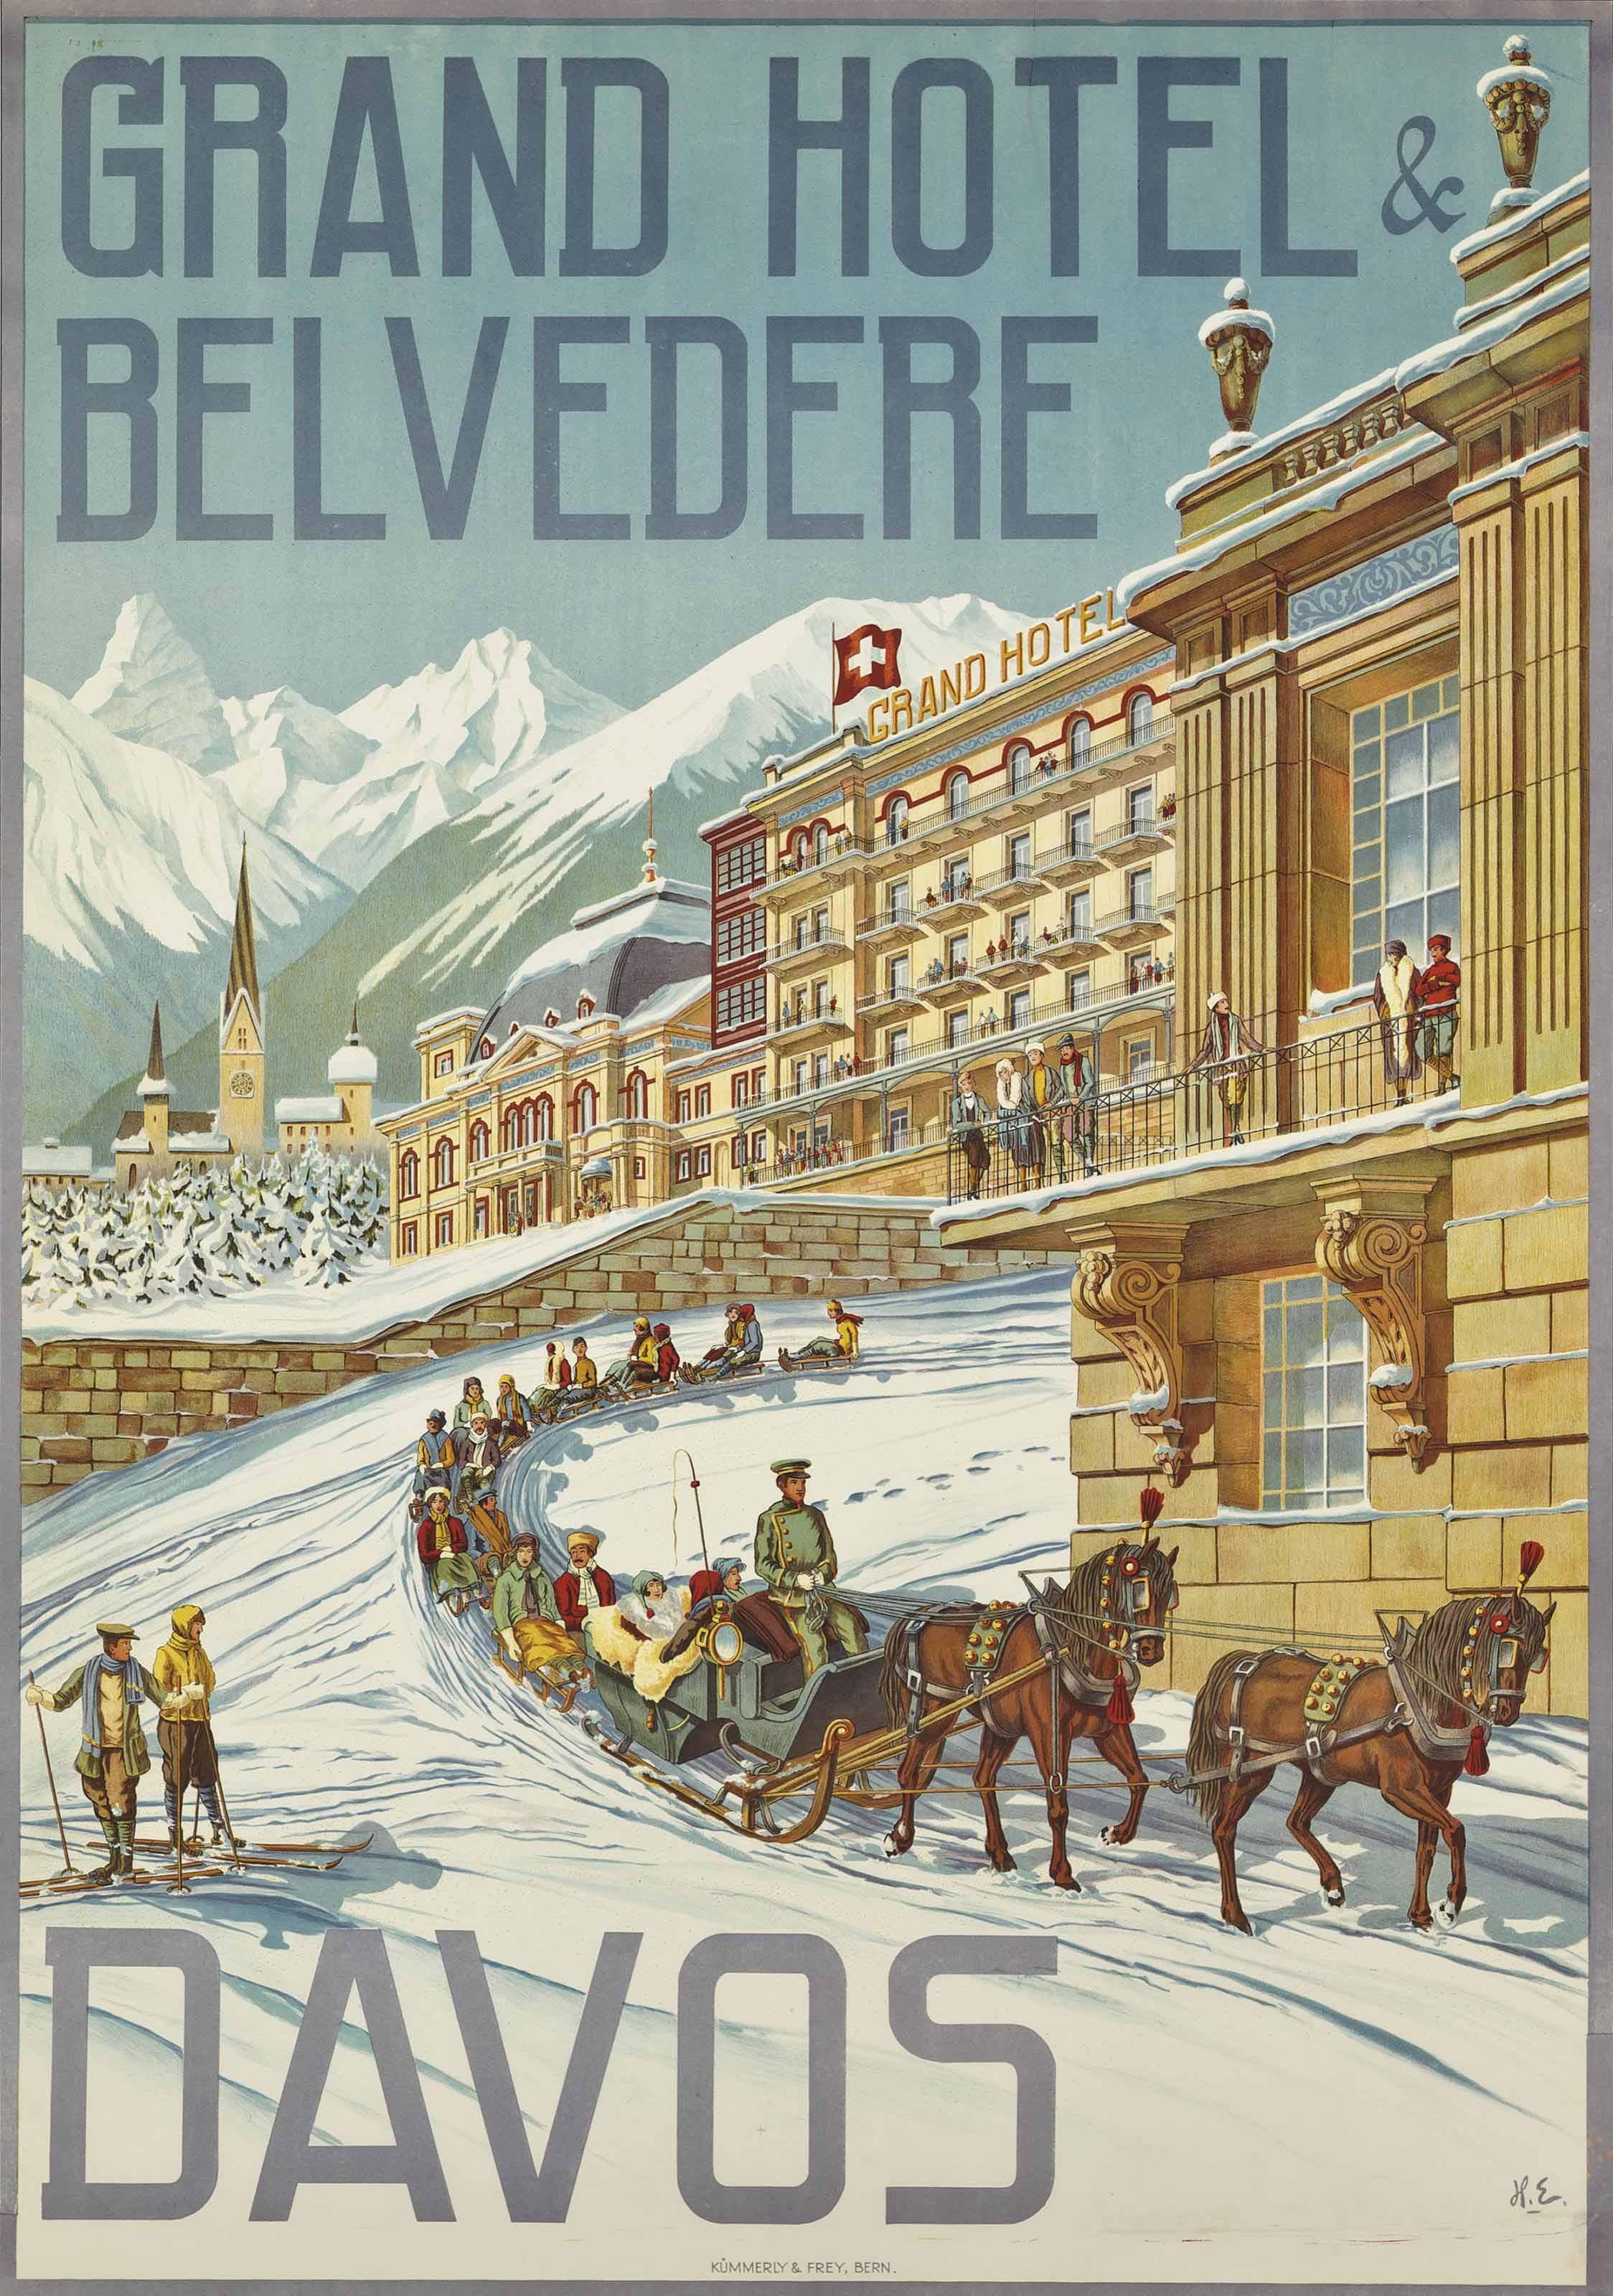 Belvedere Grand Hotel Scharbeutz